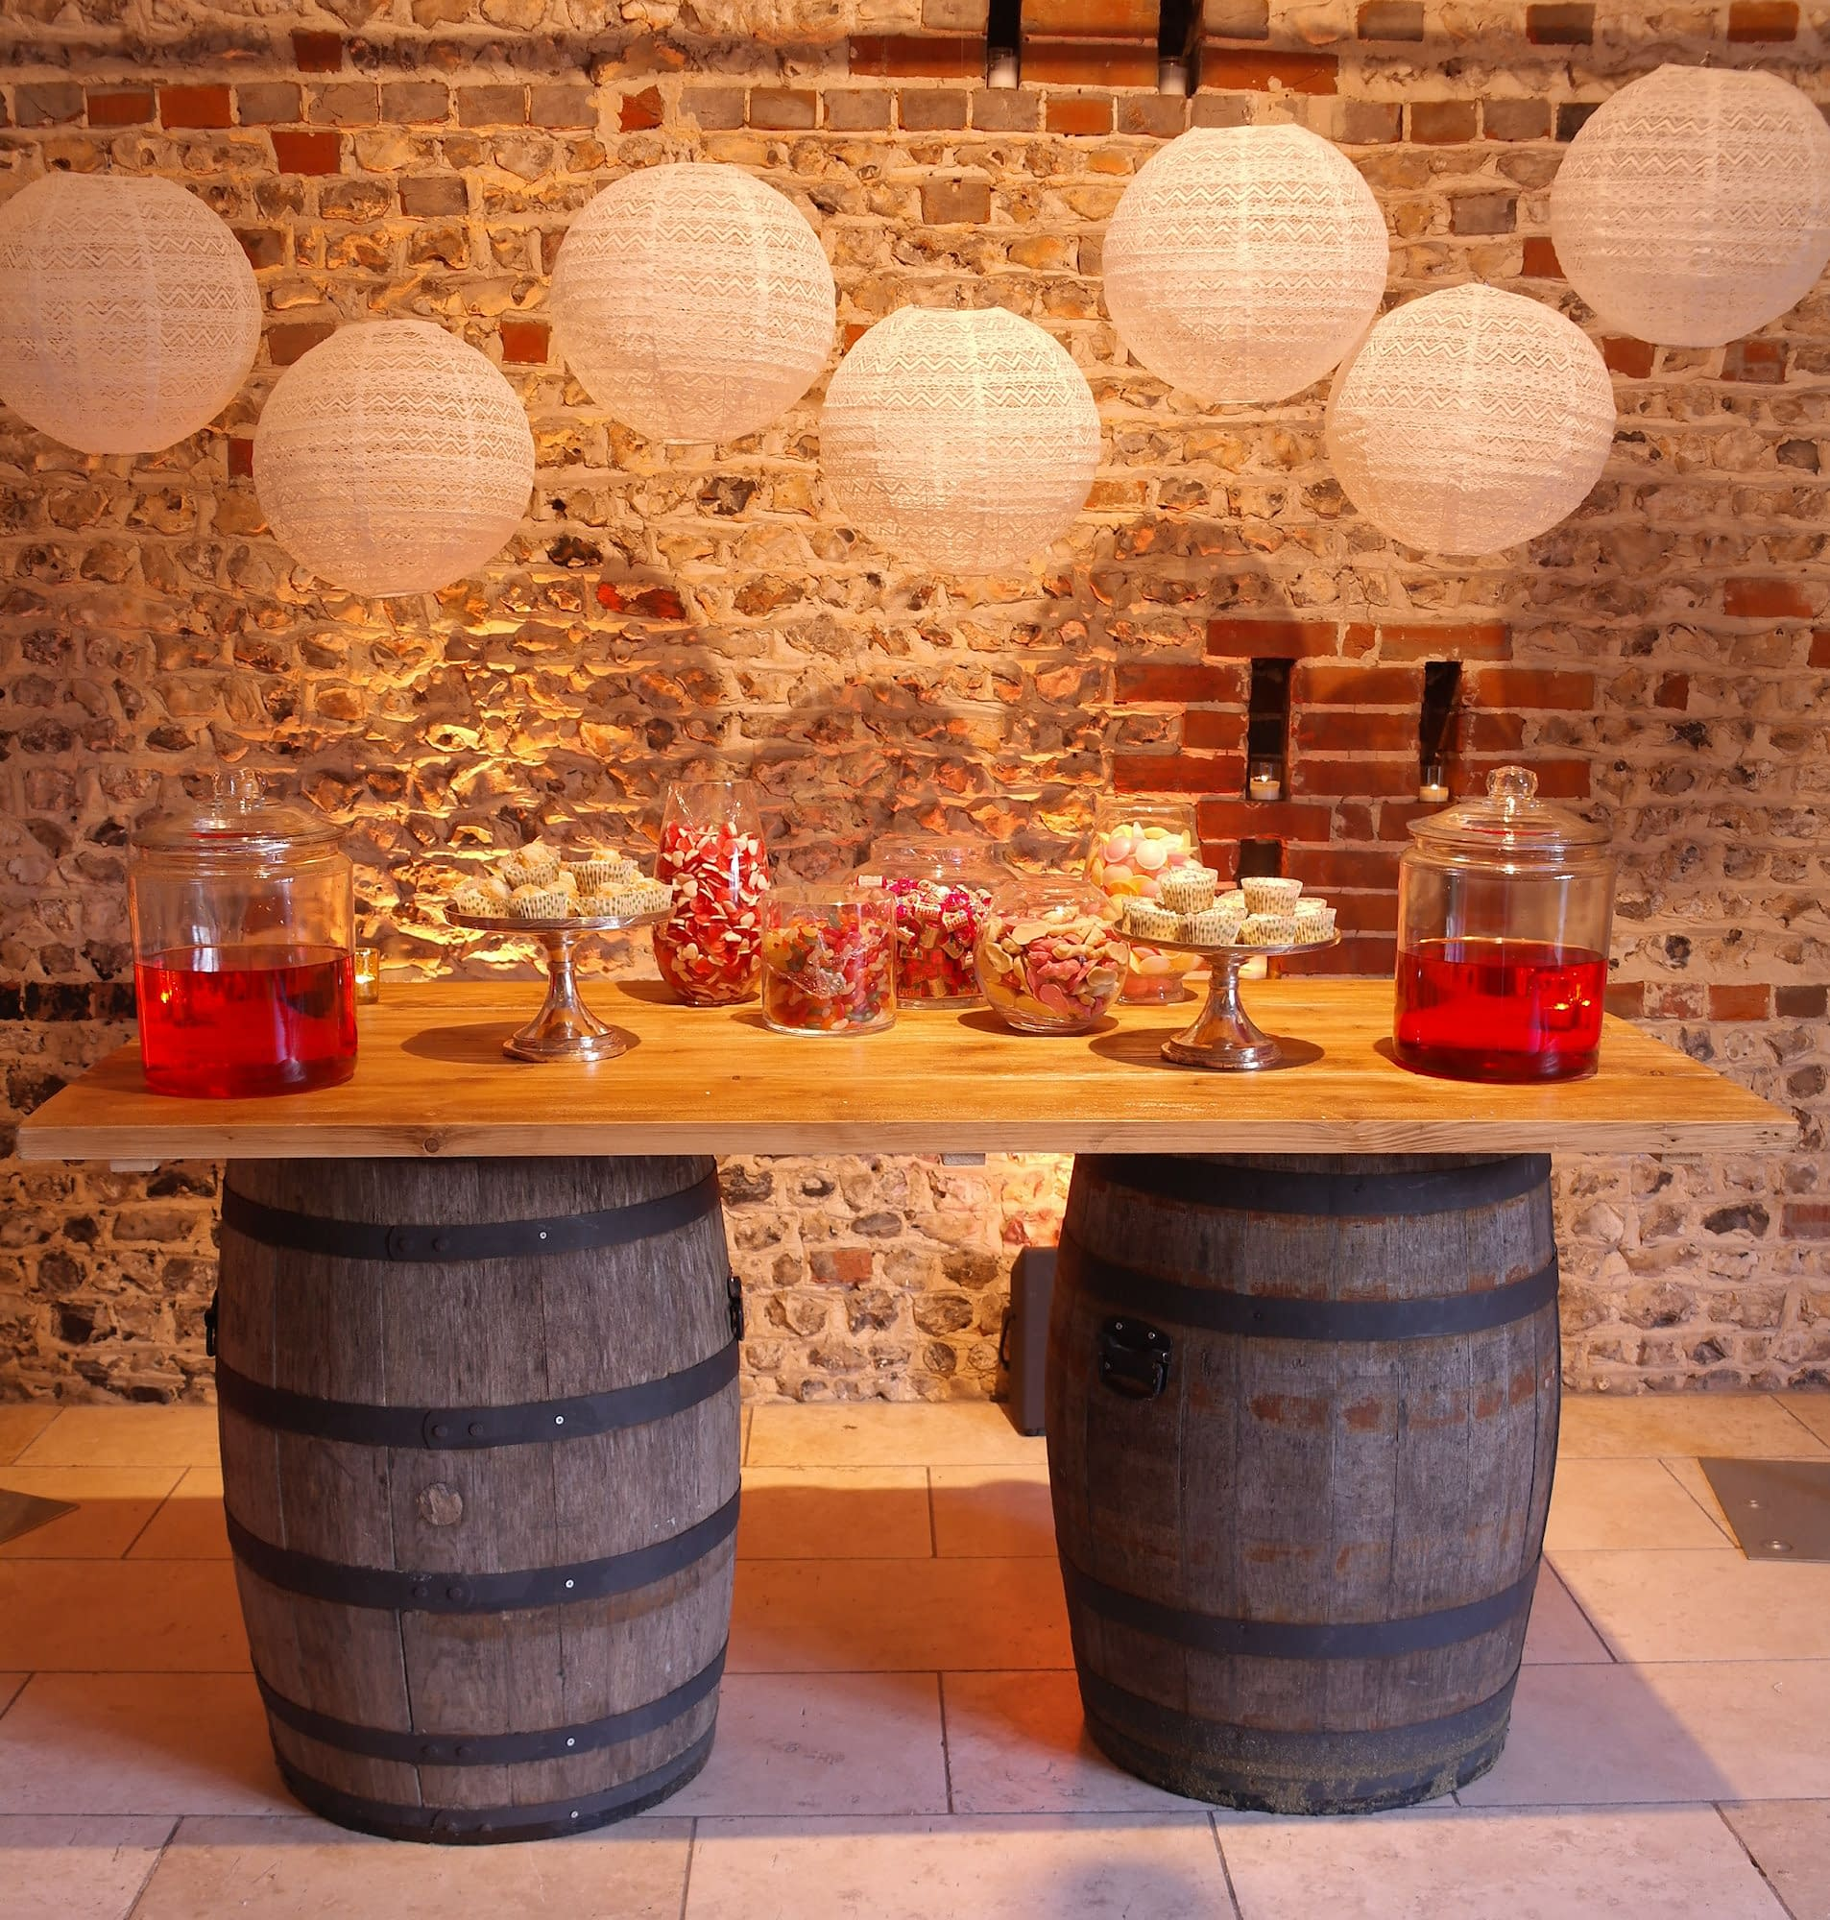 Rustic barrel bar for a sweet display with pretty lace lantern cluster overhead at Upwaltham Barns wedding venue Surrey